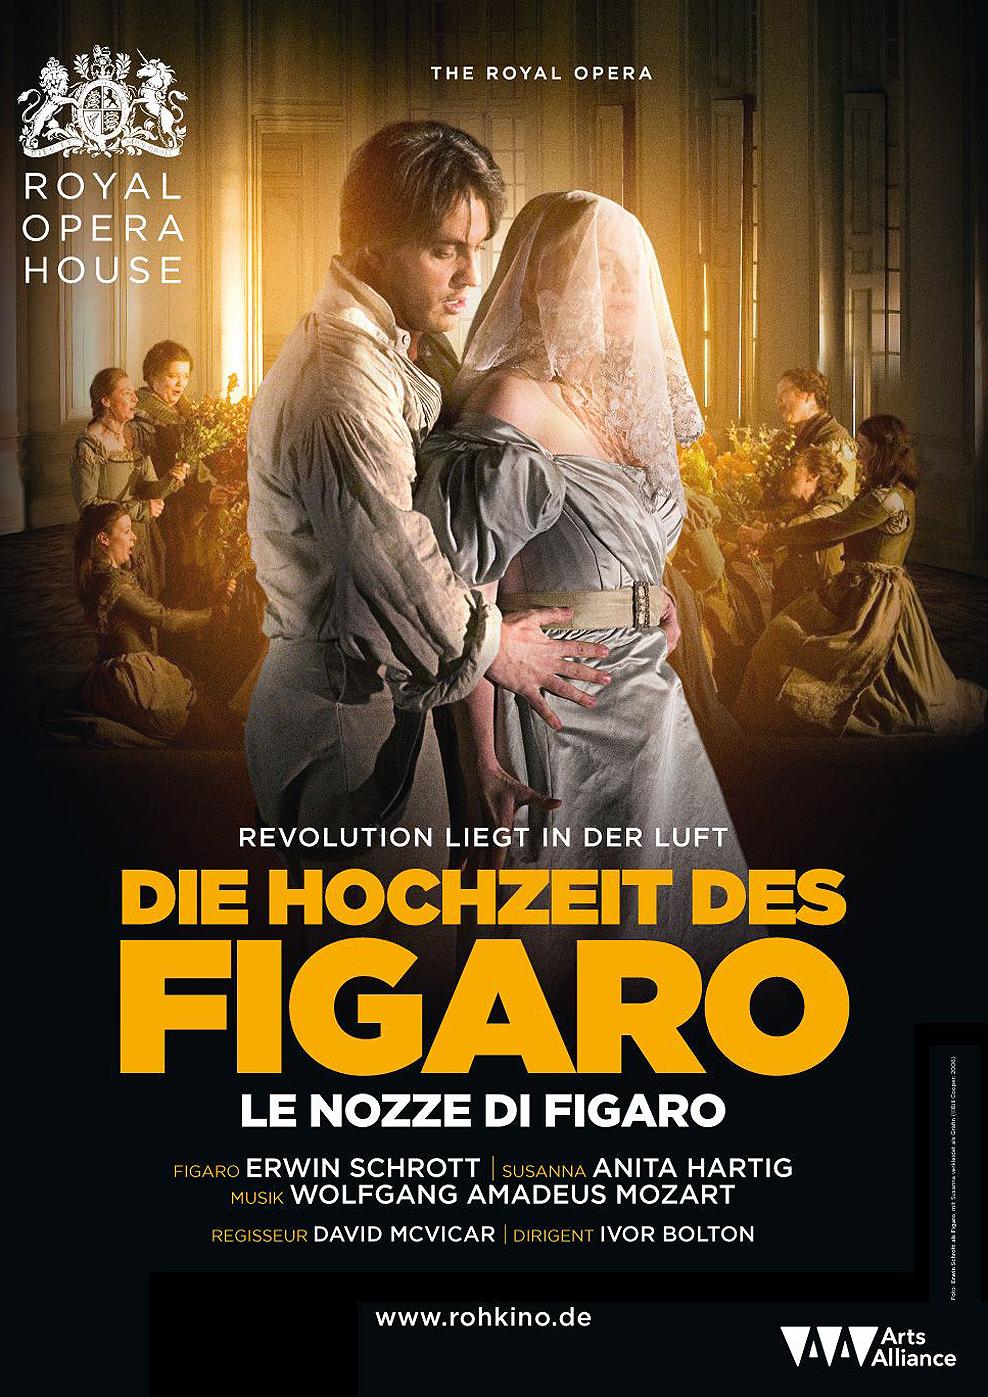 Royal Opera House 2015/16: Die Hochzeit des Figaro - Le Nozze di Figaro (Poster)